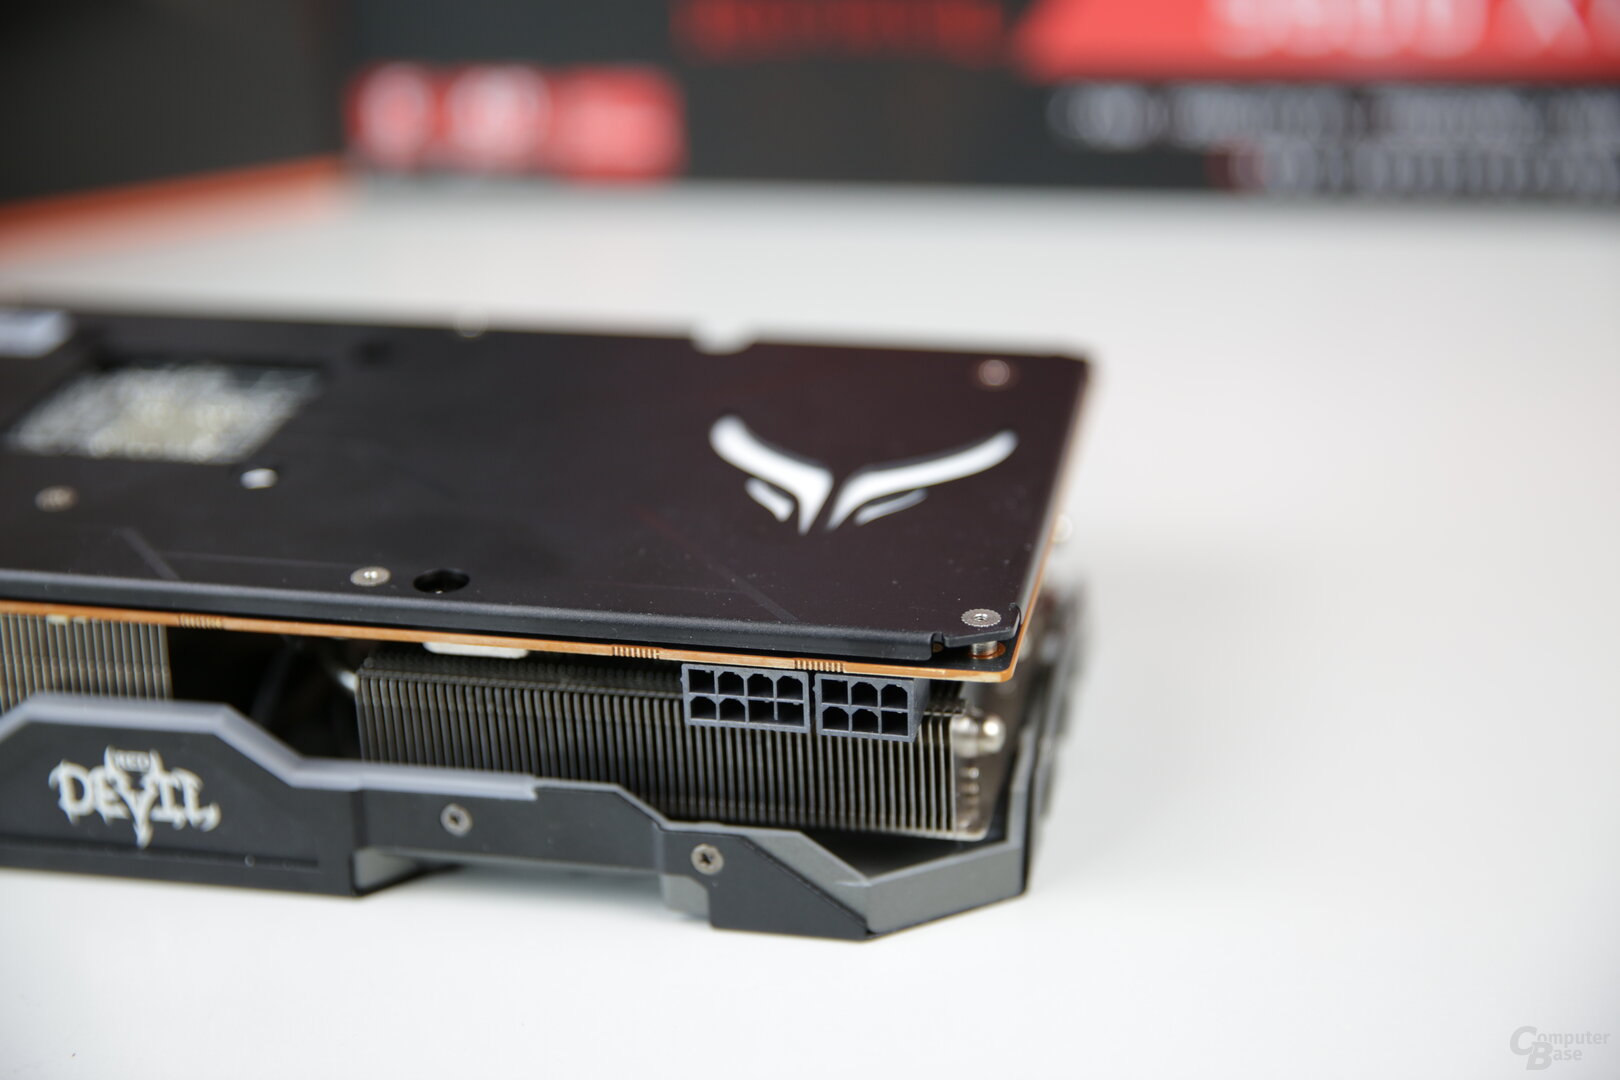 Stromanschluss der PowerColor Radeon RX 5600 XT Red Devil